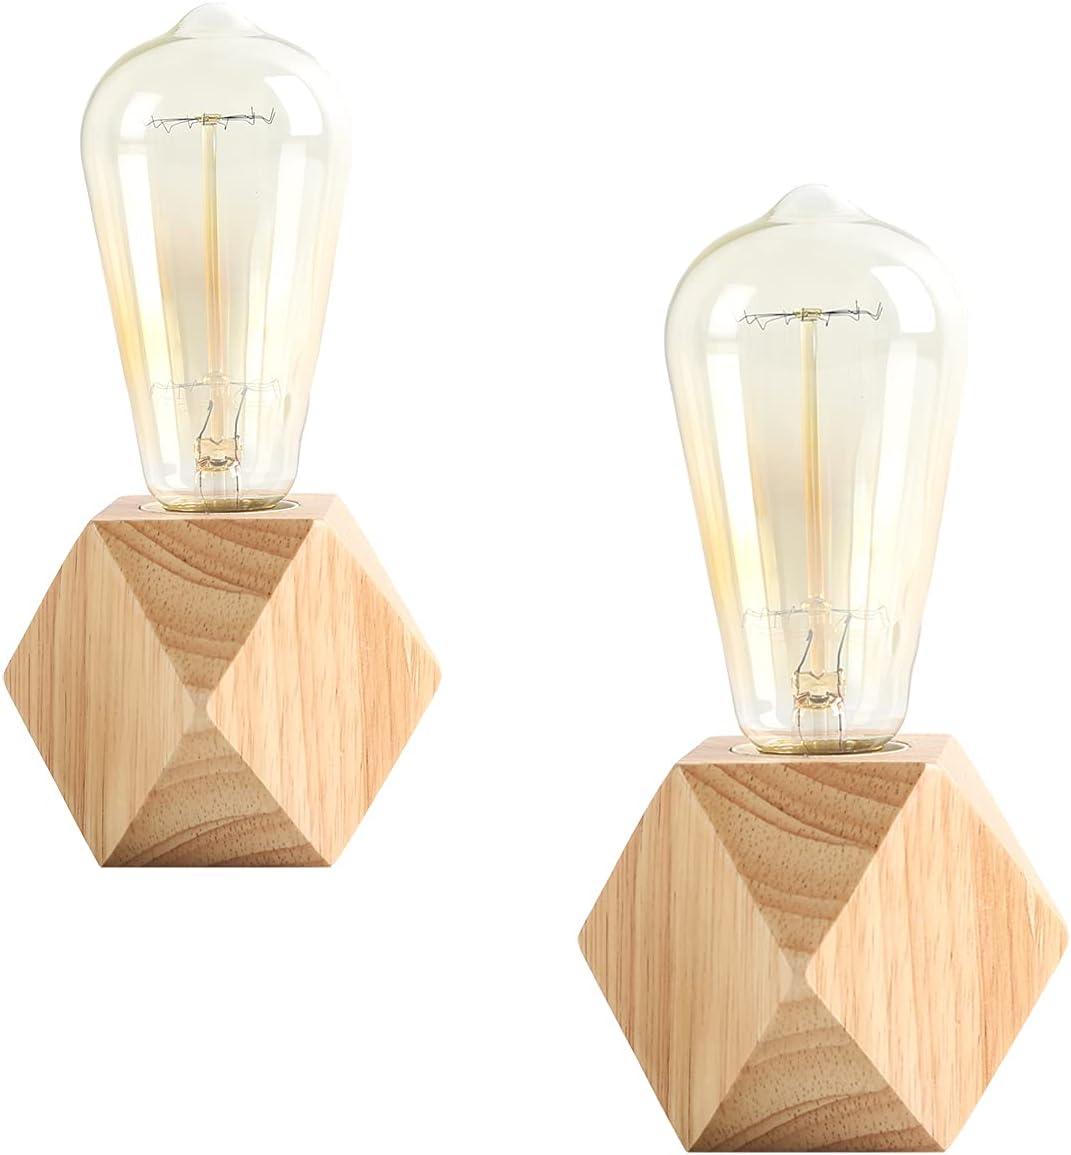 OuXean 2 uds.Lámpara de mesa pequeña Lámpara de noche con base de madera de diamante junto a la lámpara, E27 60W Perfecta para dormitorio, salón u oficina (sin bombilla)